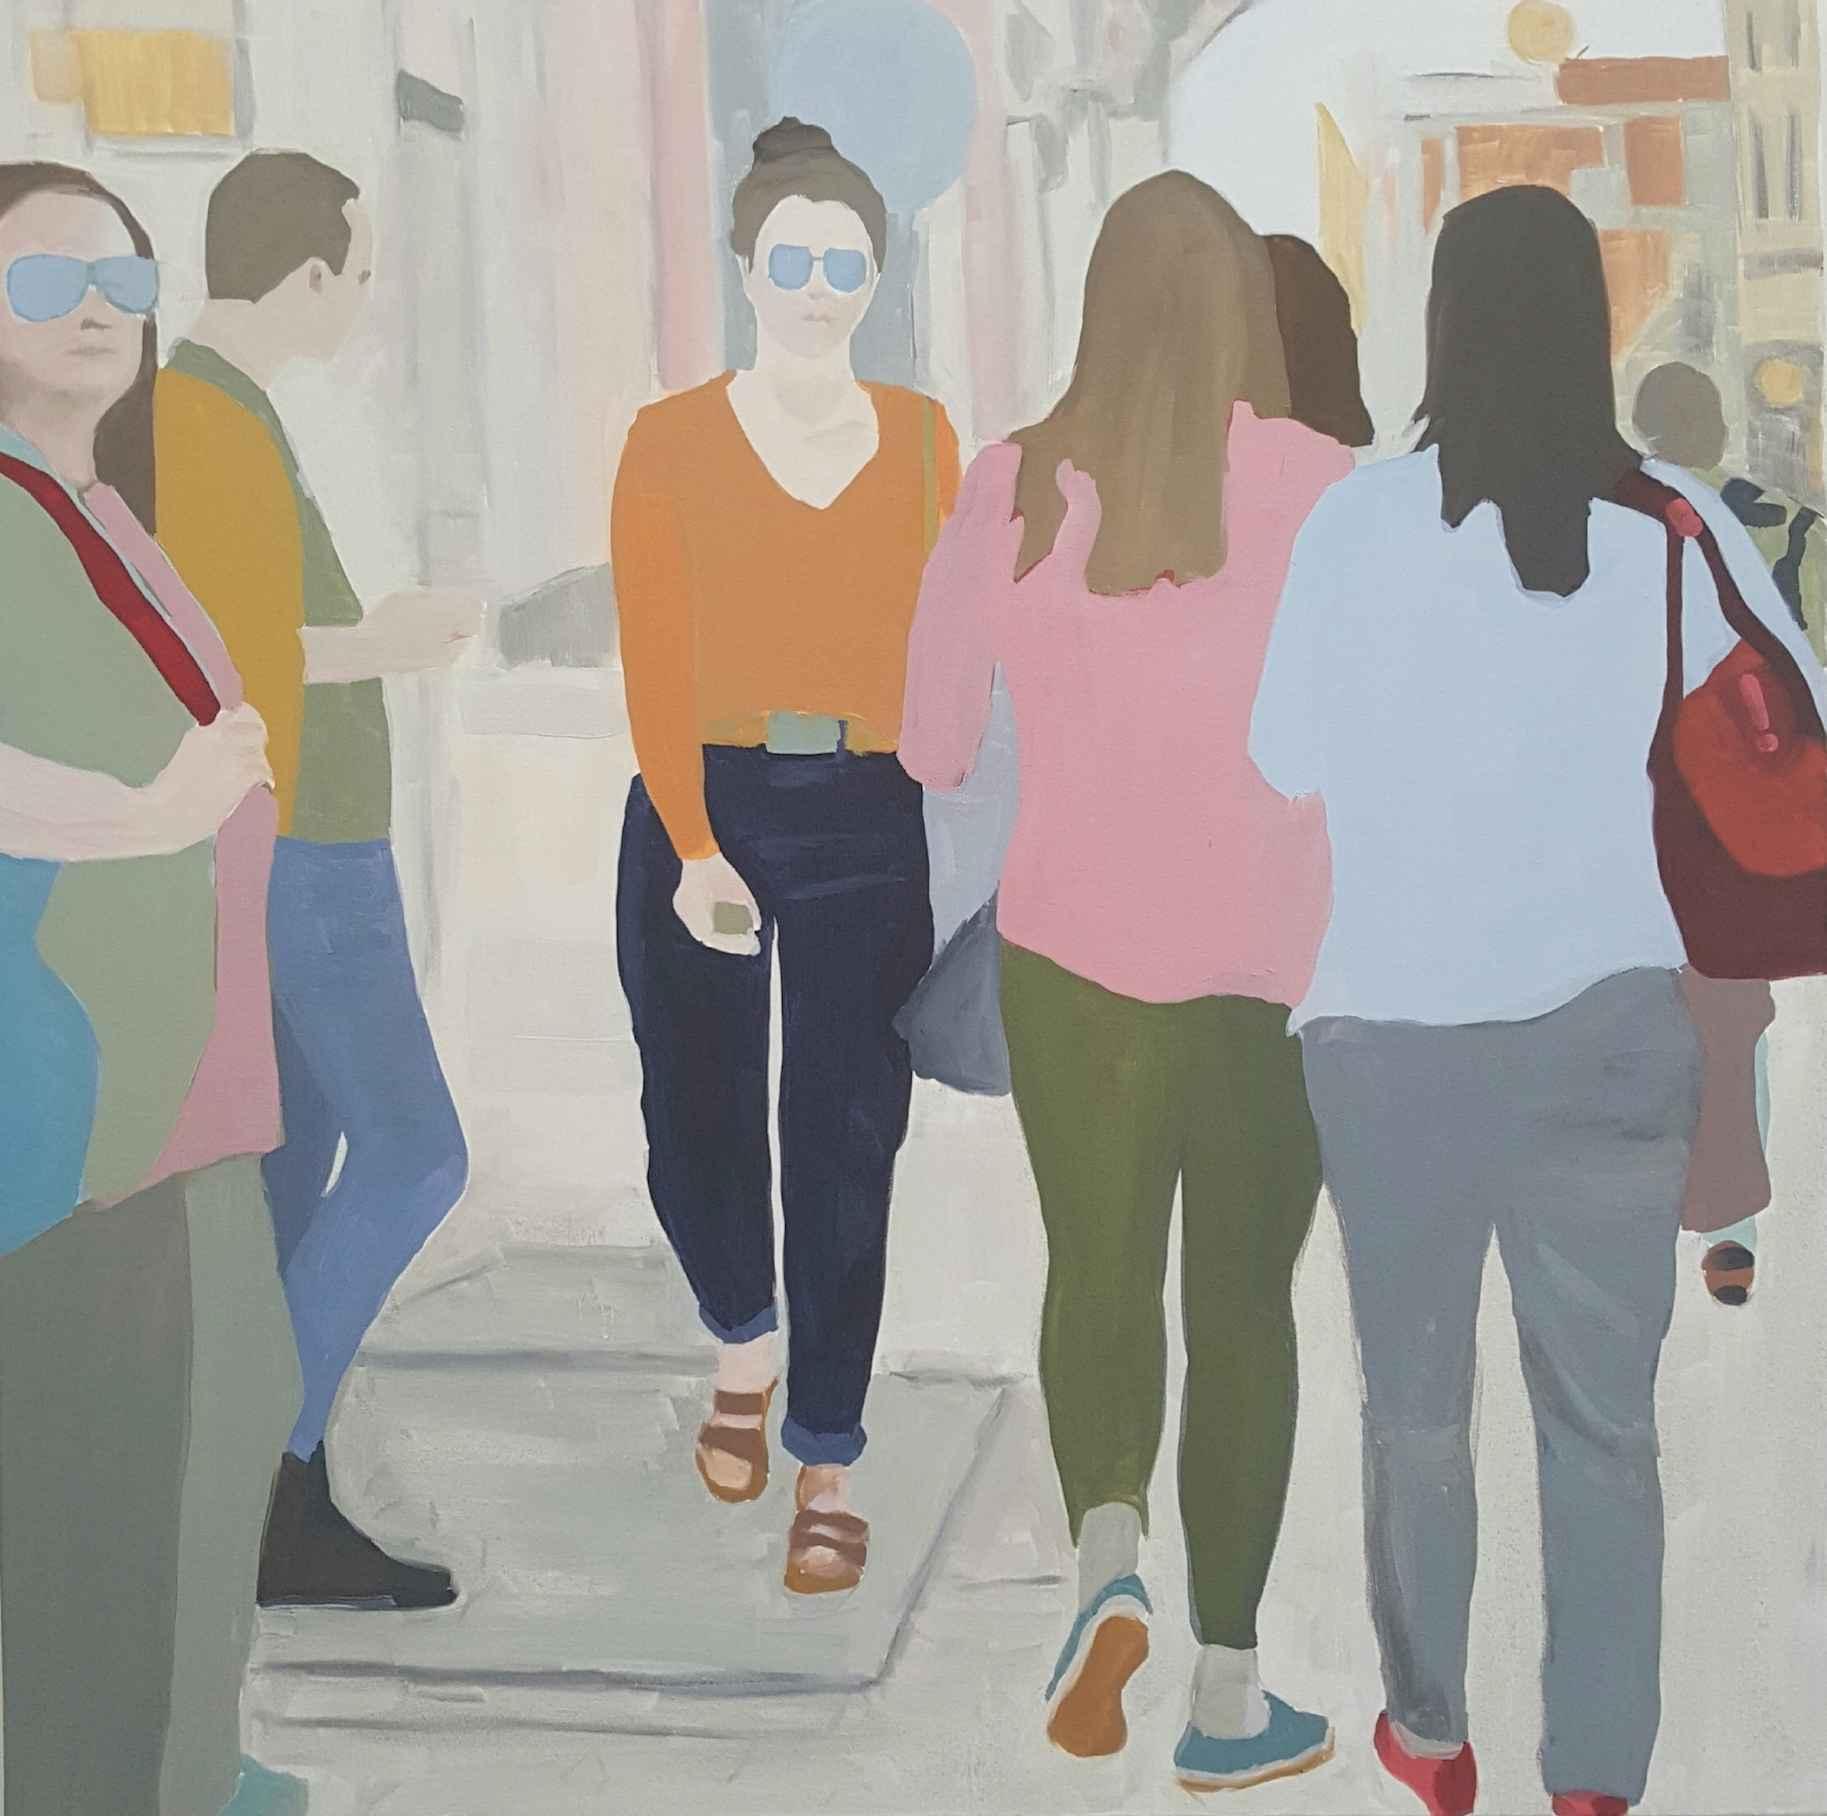 Passerby 1 by  Sherry Czekus - Masterpiece Online